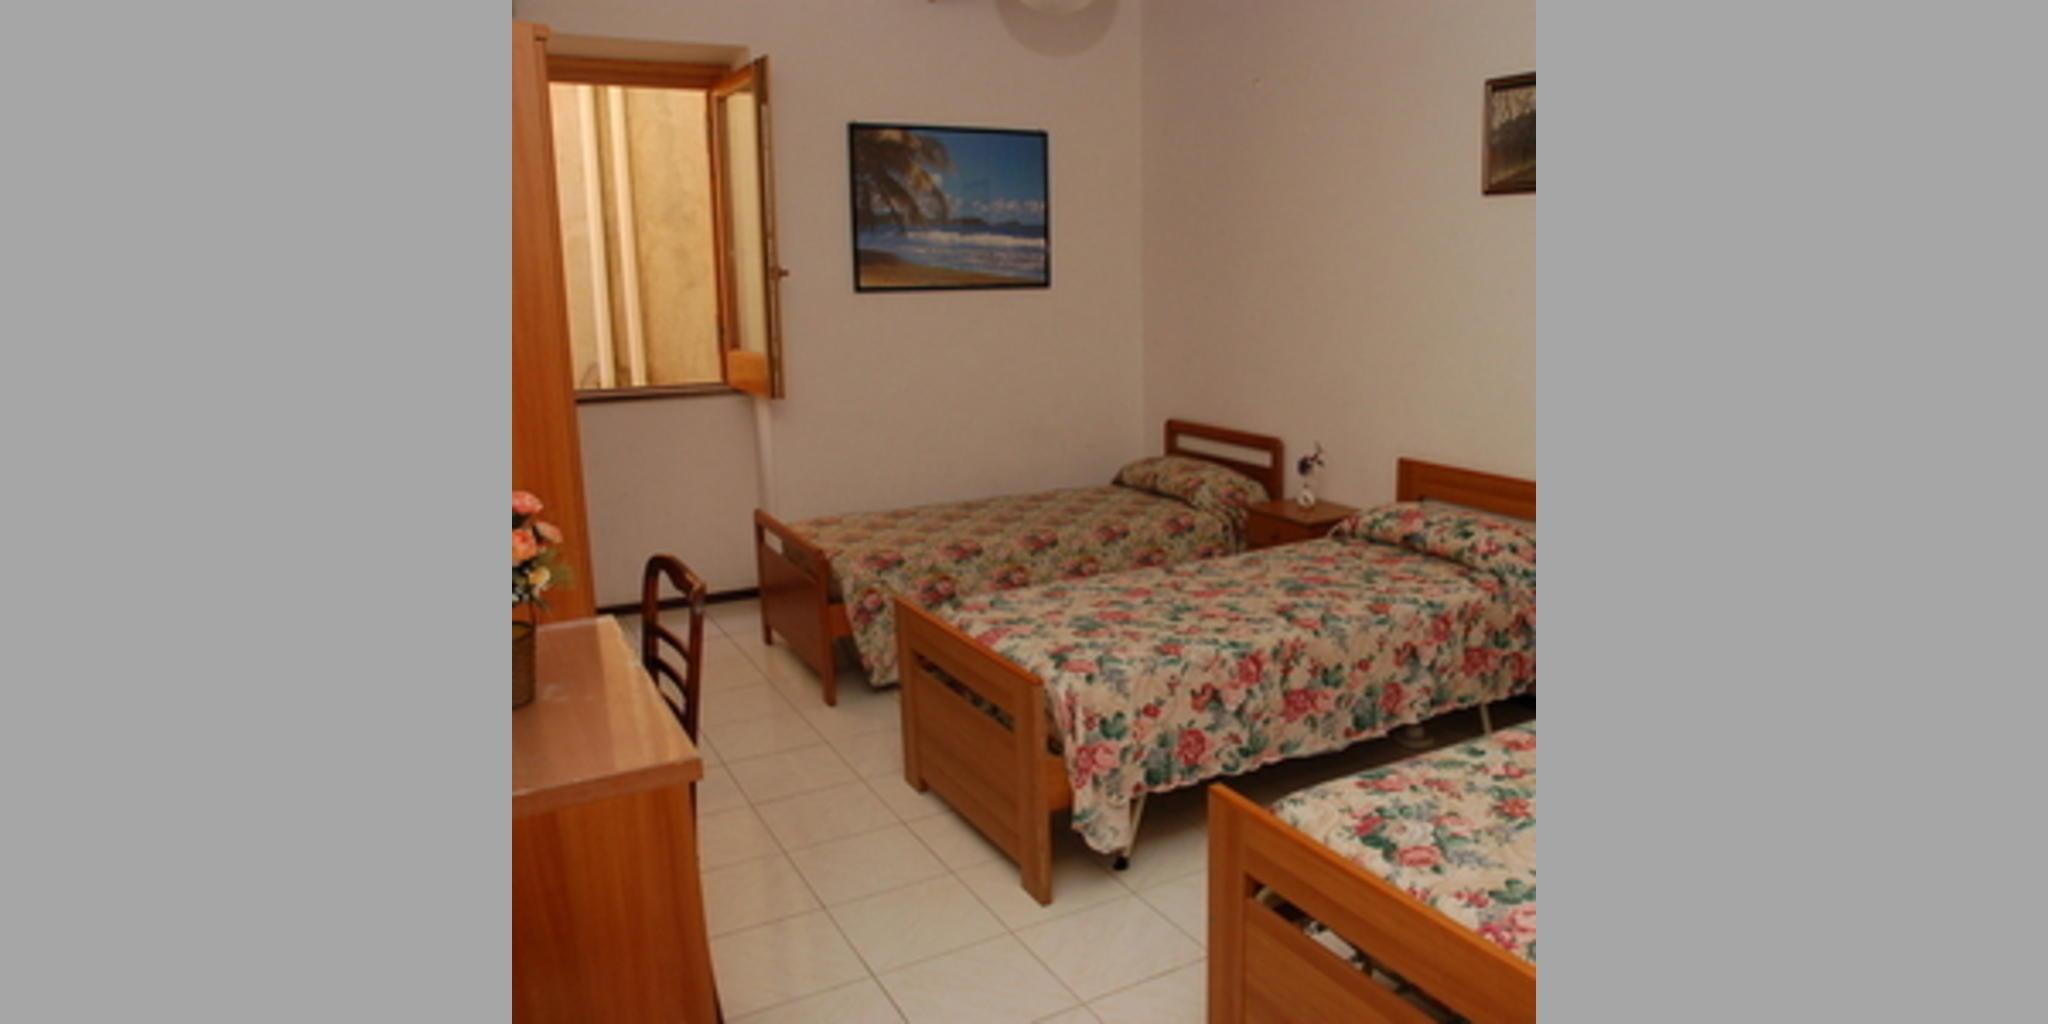 Guest House Lipari - Marina Corta